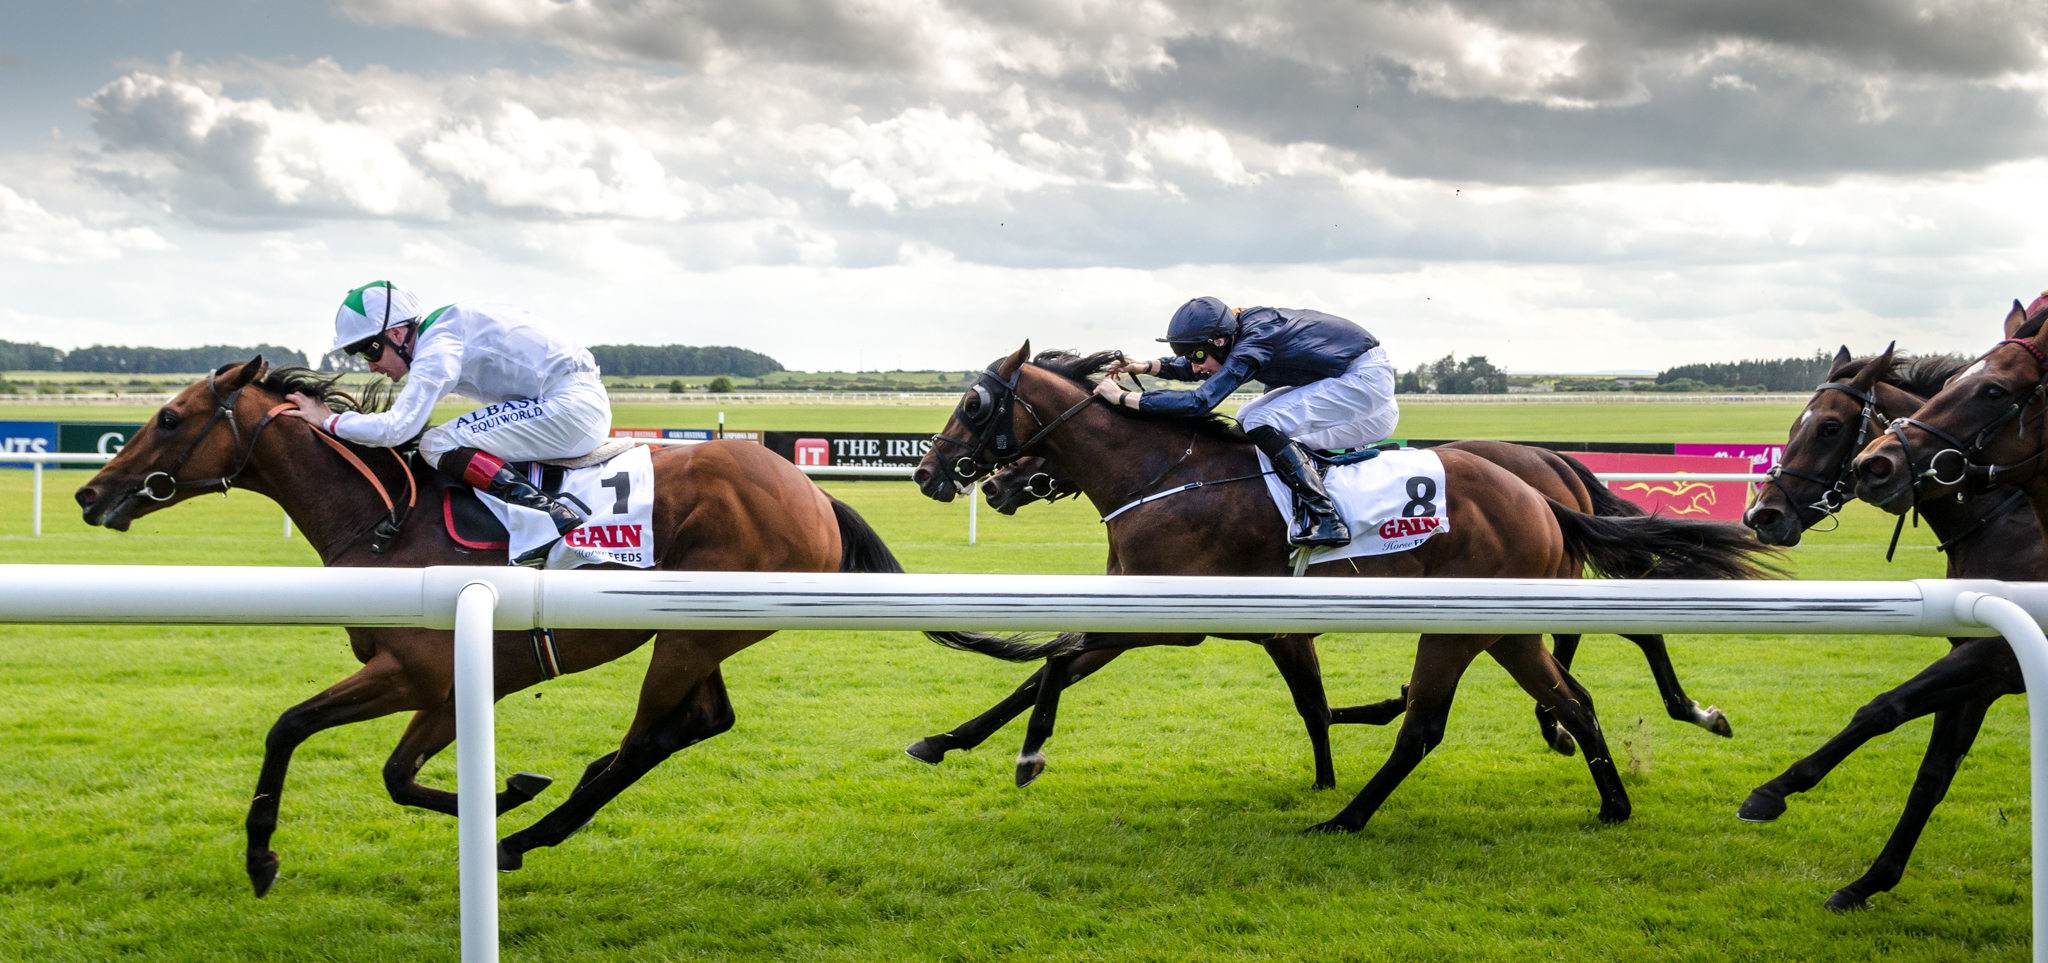 Irish horse racing betting terms claro tv colombia win sports betting